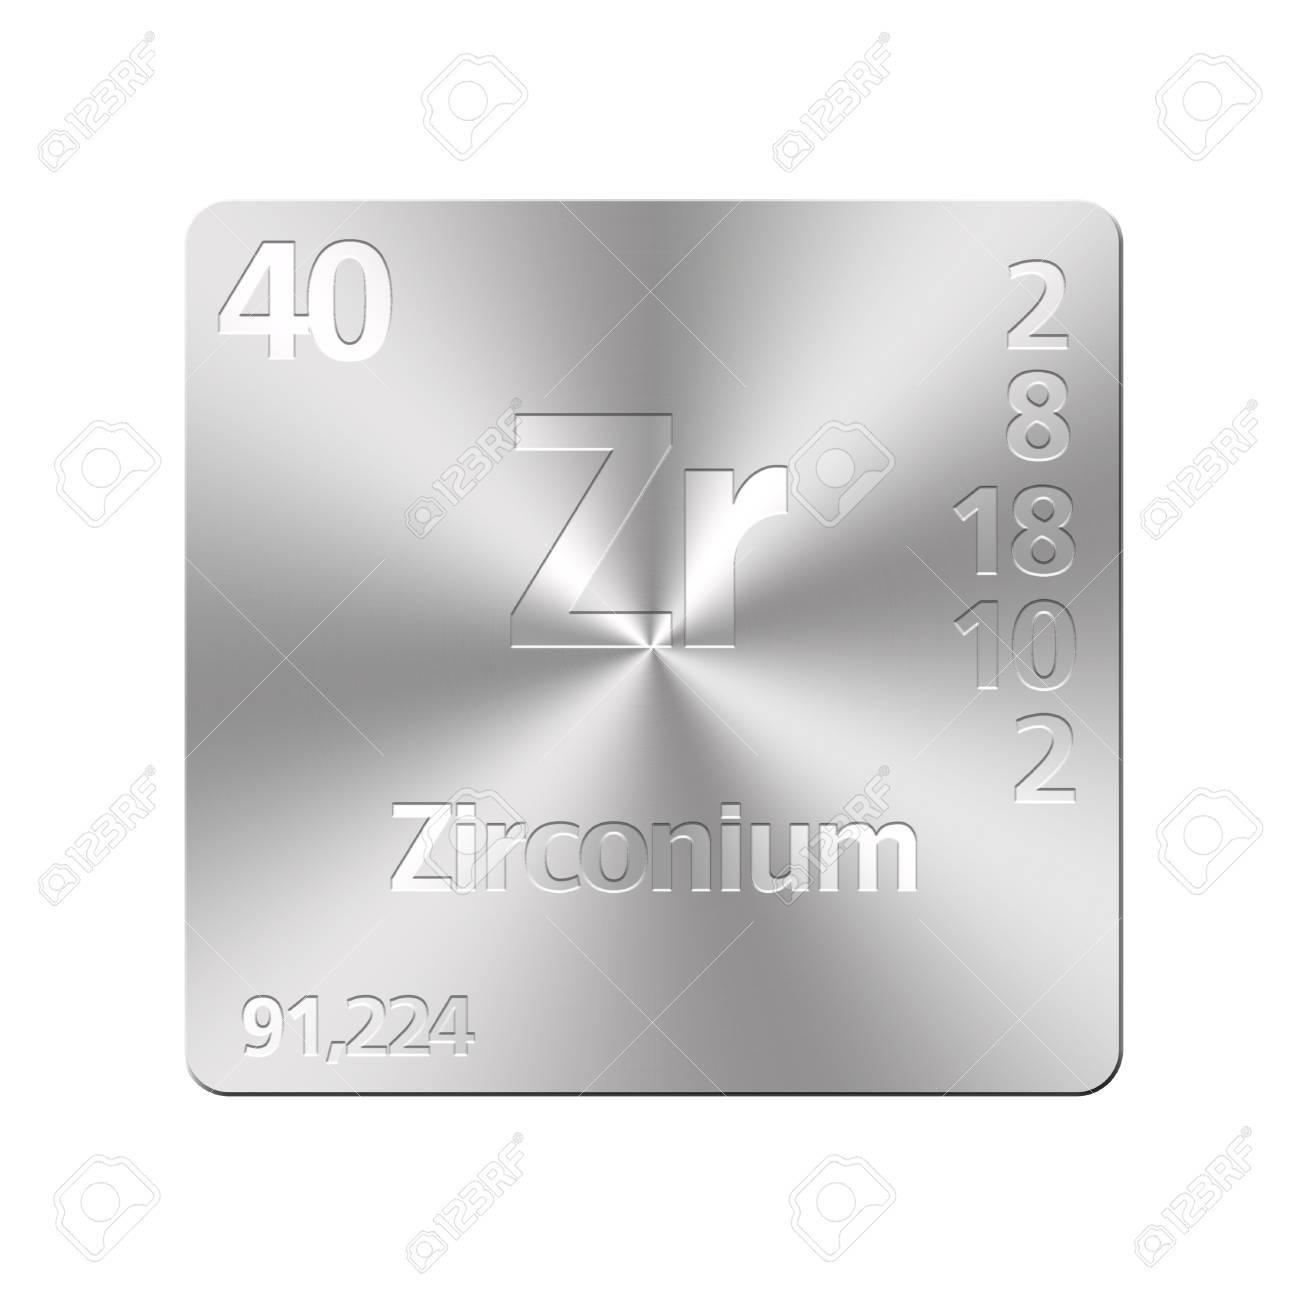 Zirconium periodic table best table 2018 zirconium element symbol periodic table stickers by urtaz Images